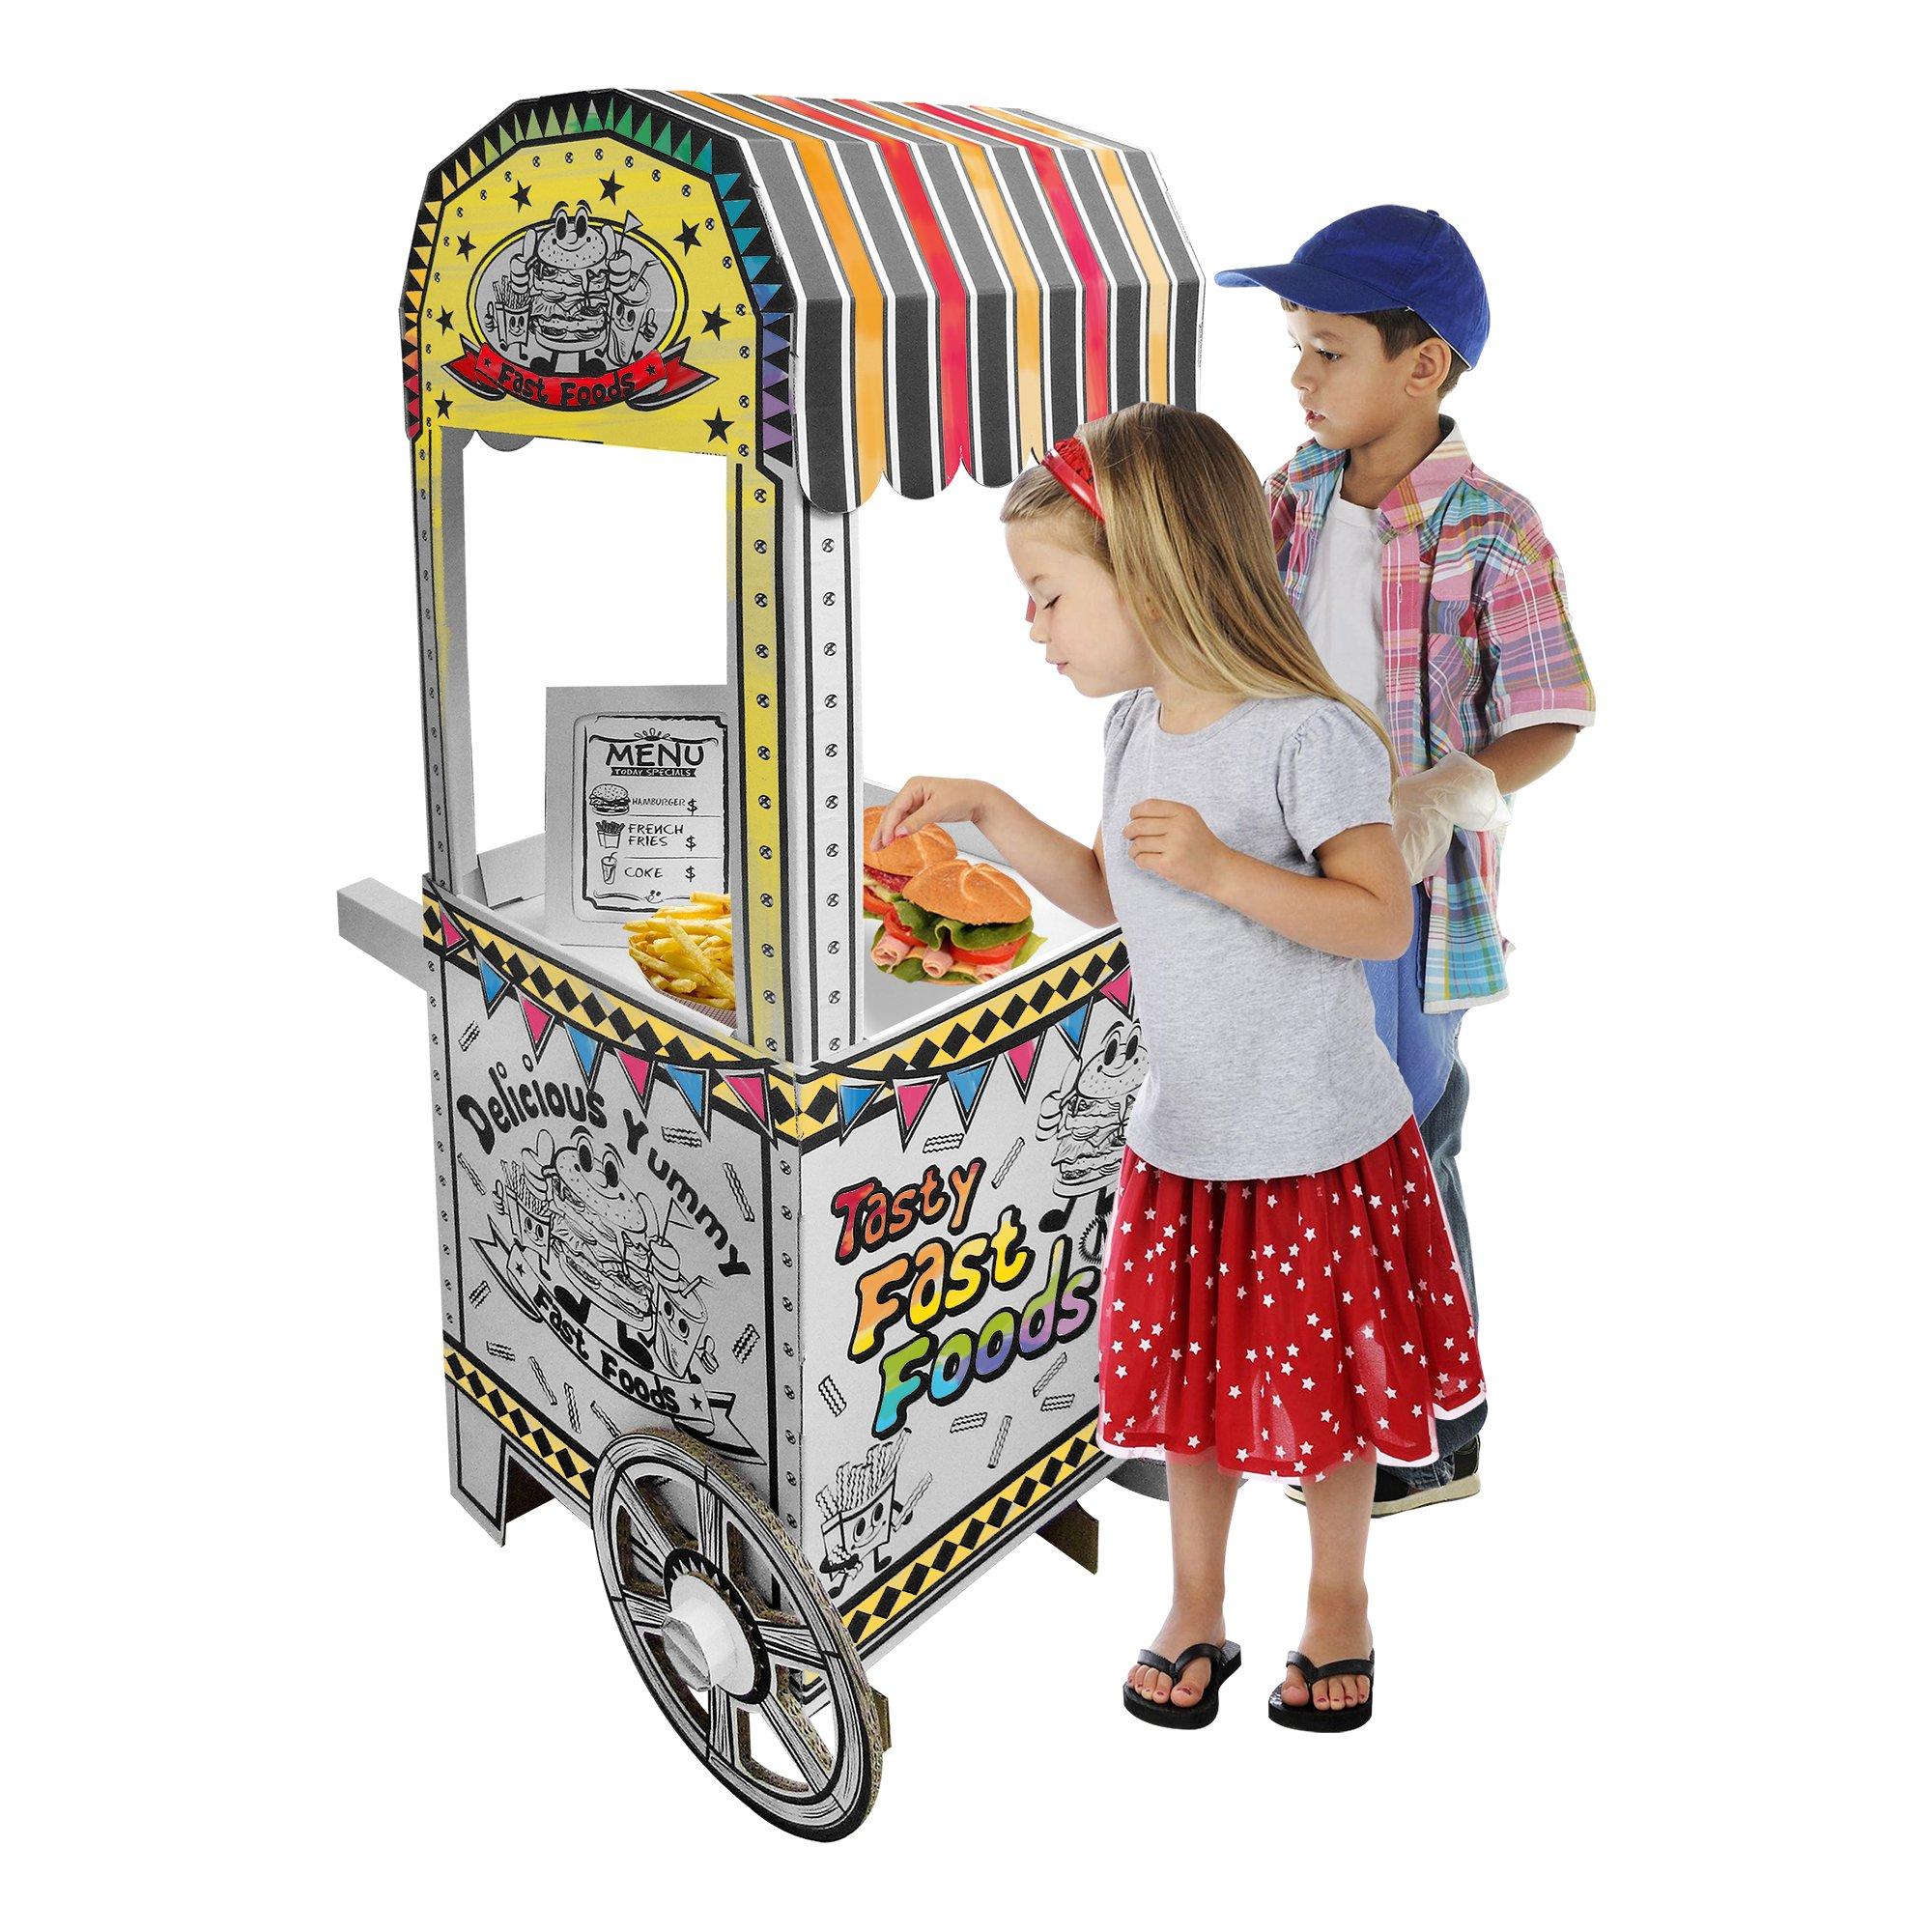 Fat Catalog ALT-ERU1001-SO Cardboard Coloring Craft, Kid-Sized Food Cart, White/Black